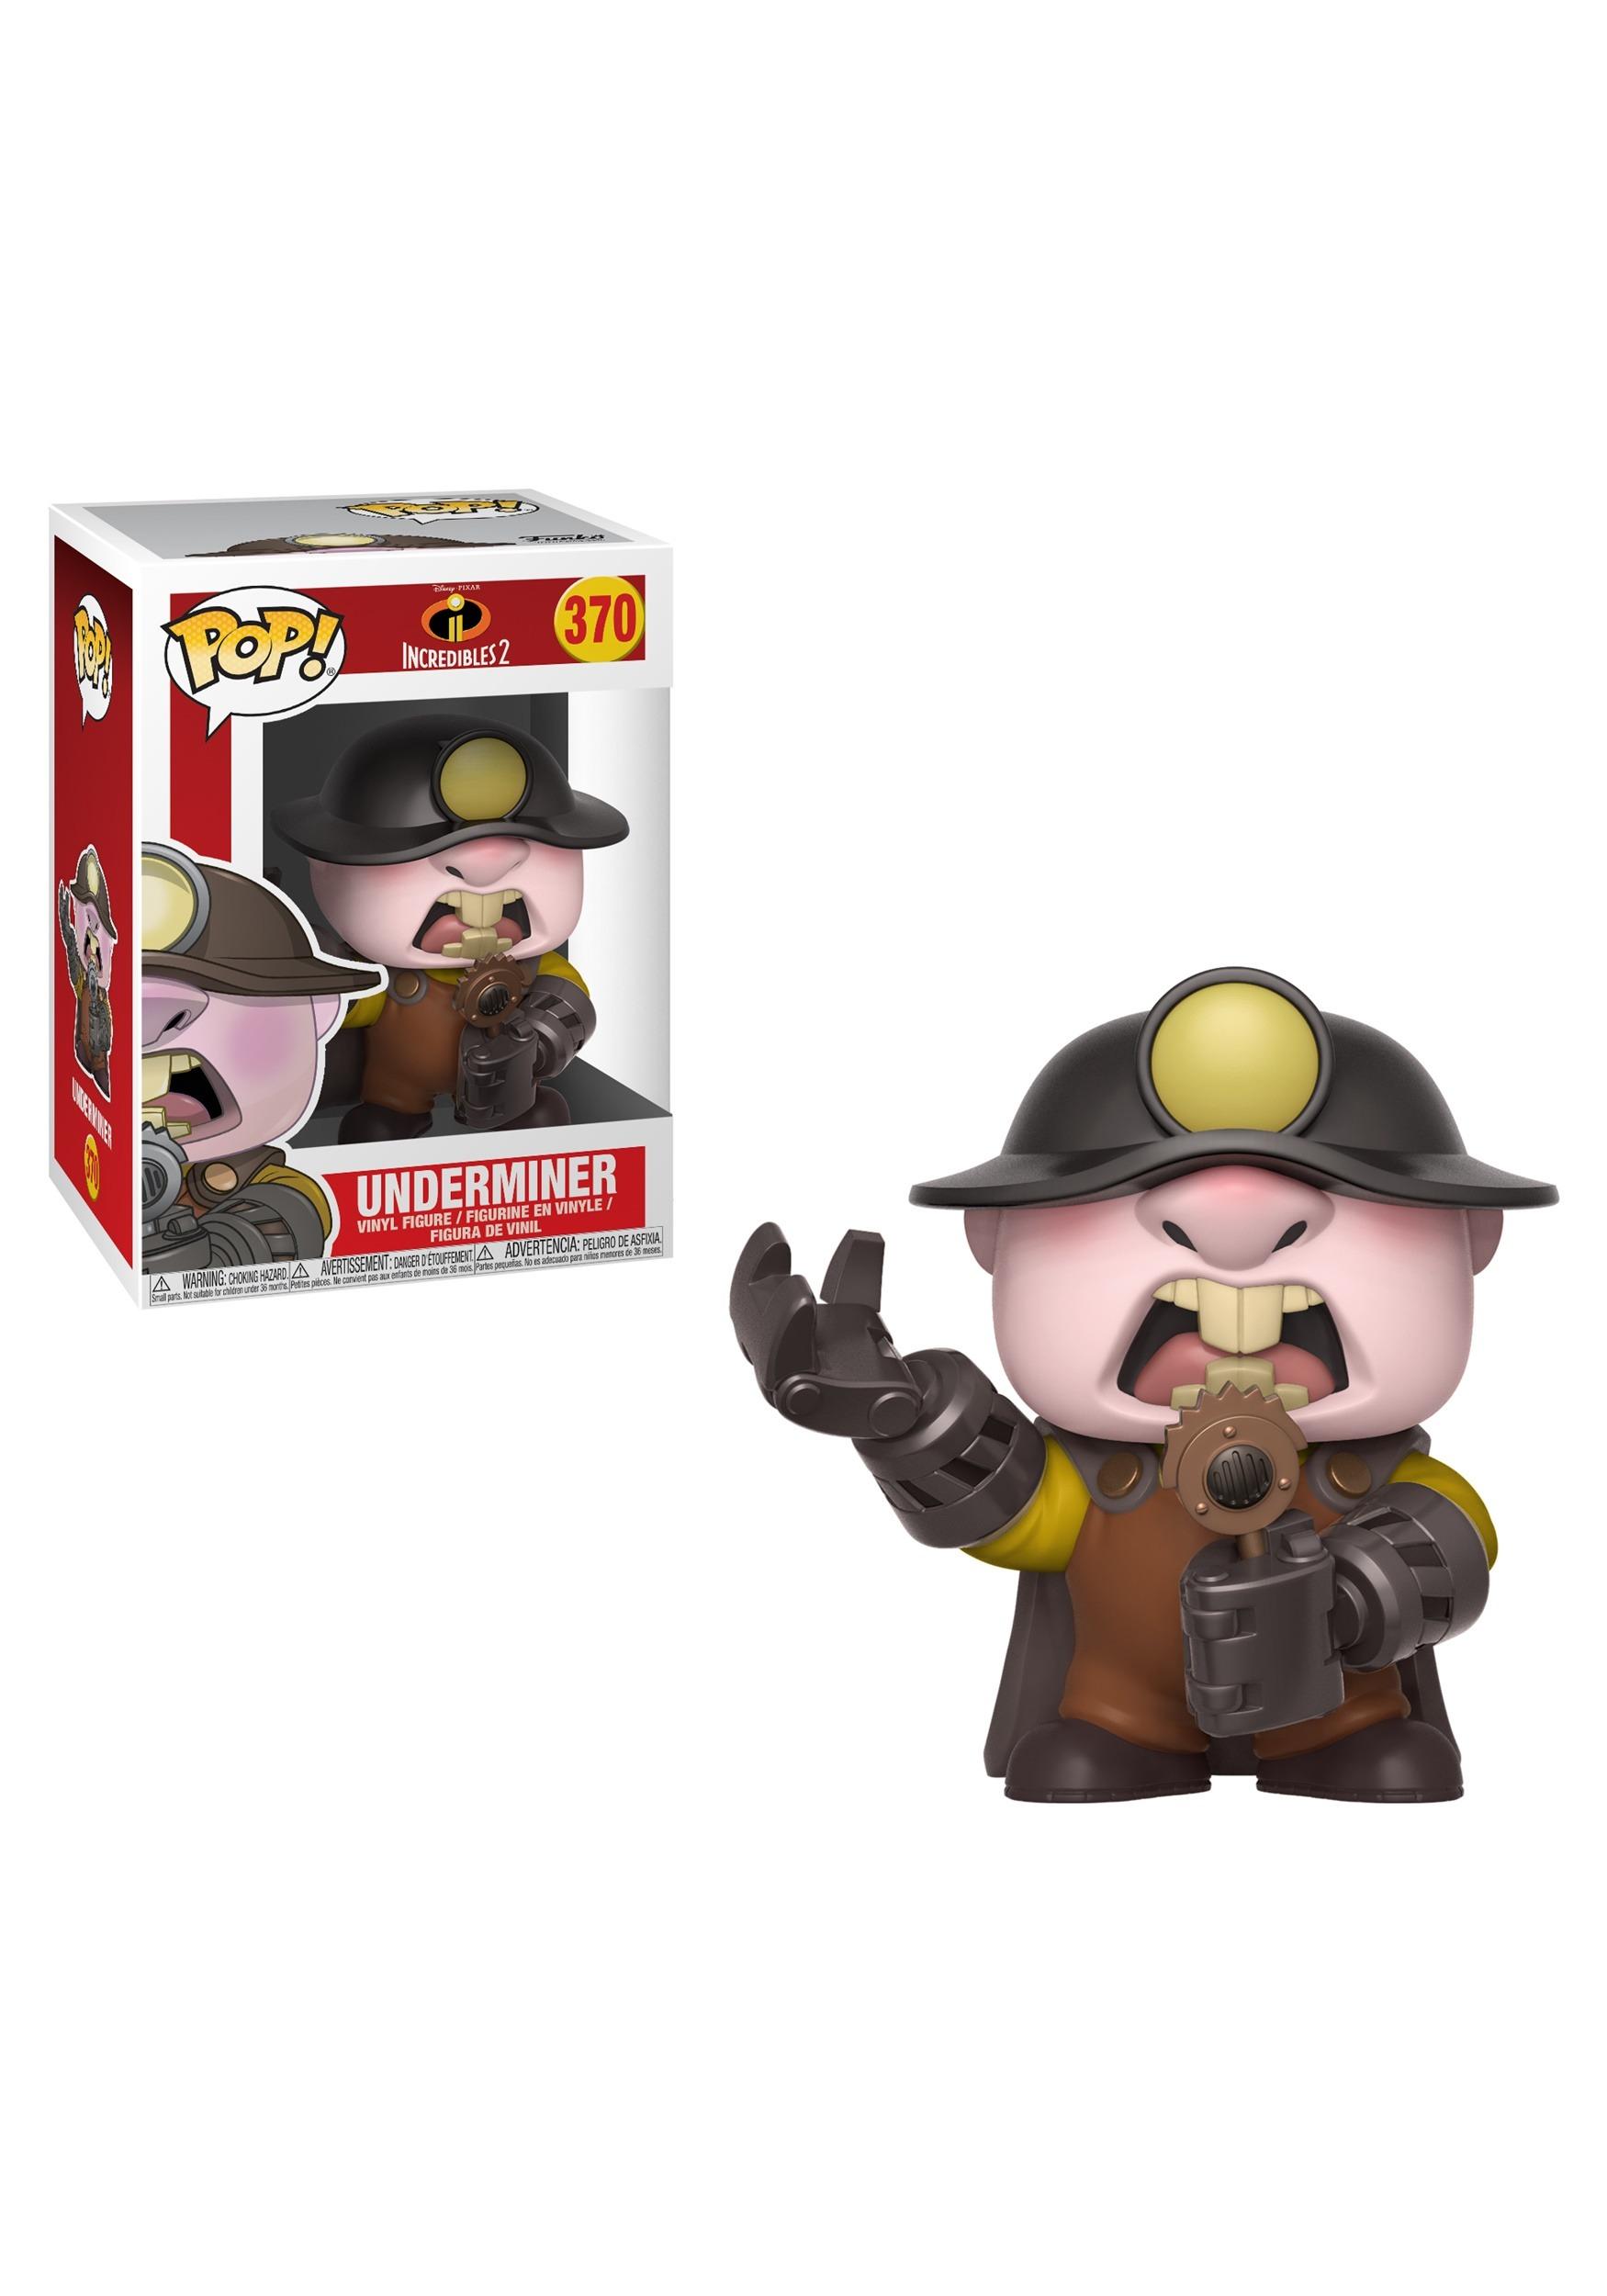 Pop Disney Underminer Figure From Incredibles 2